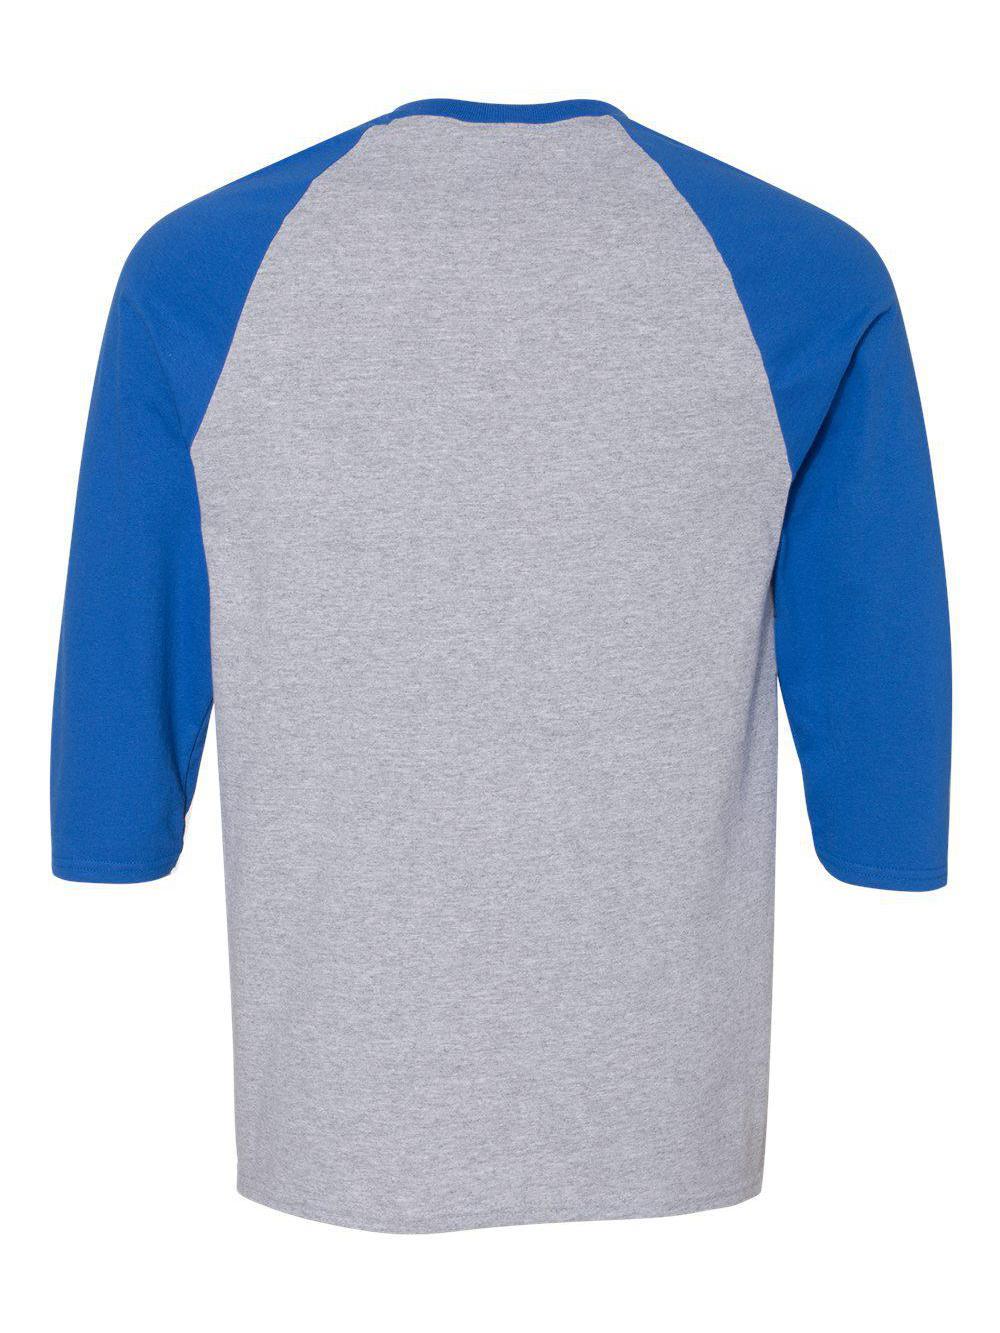 Gildan-Heavy-Cotton-Three-Quarter-Raglan-Sleeve-Baseball-T-Shirt-5700 thumbnail 16